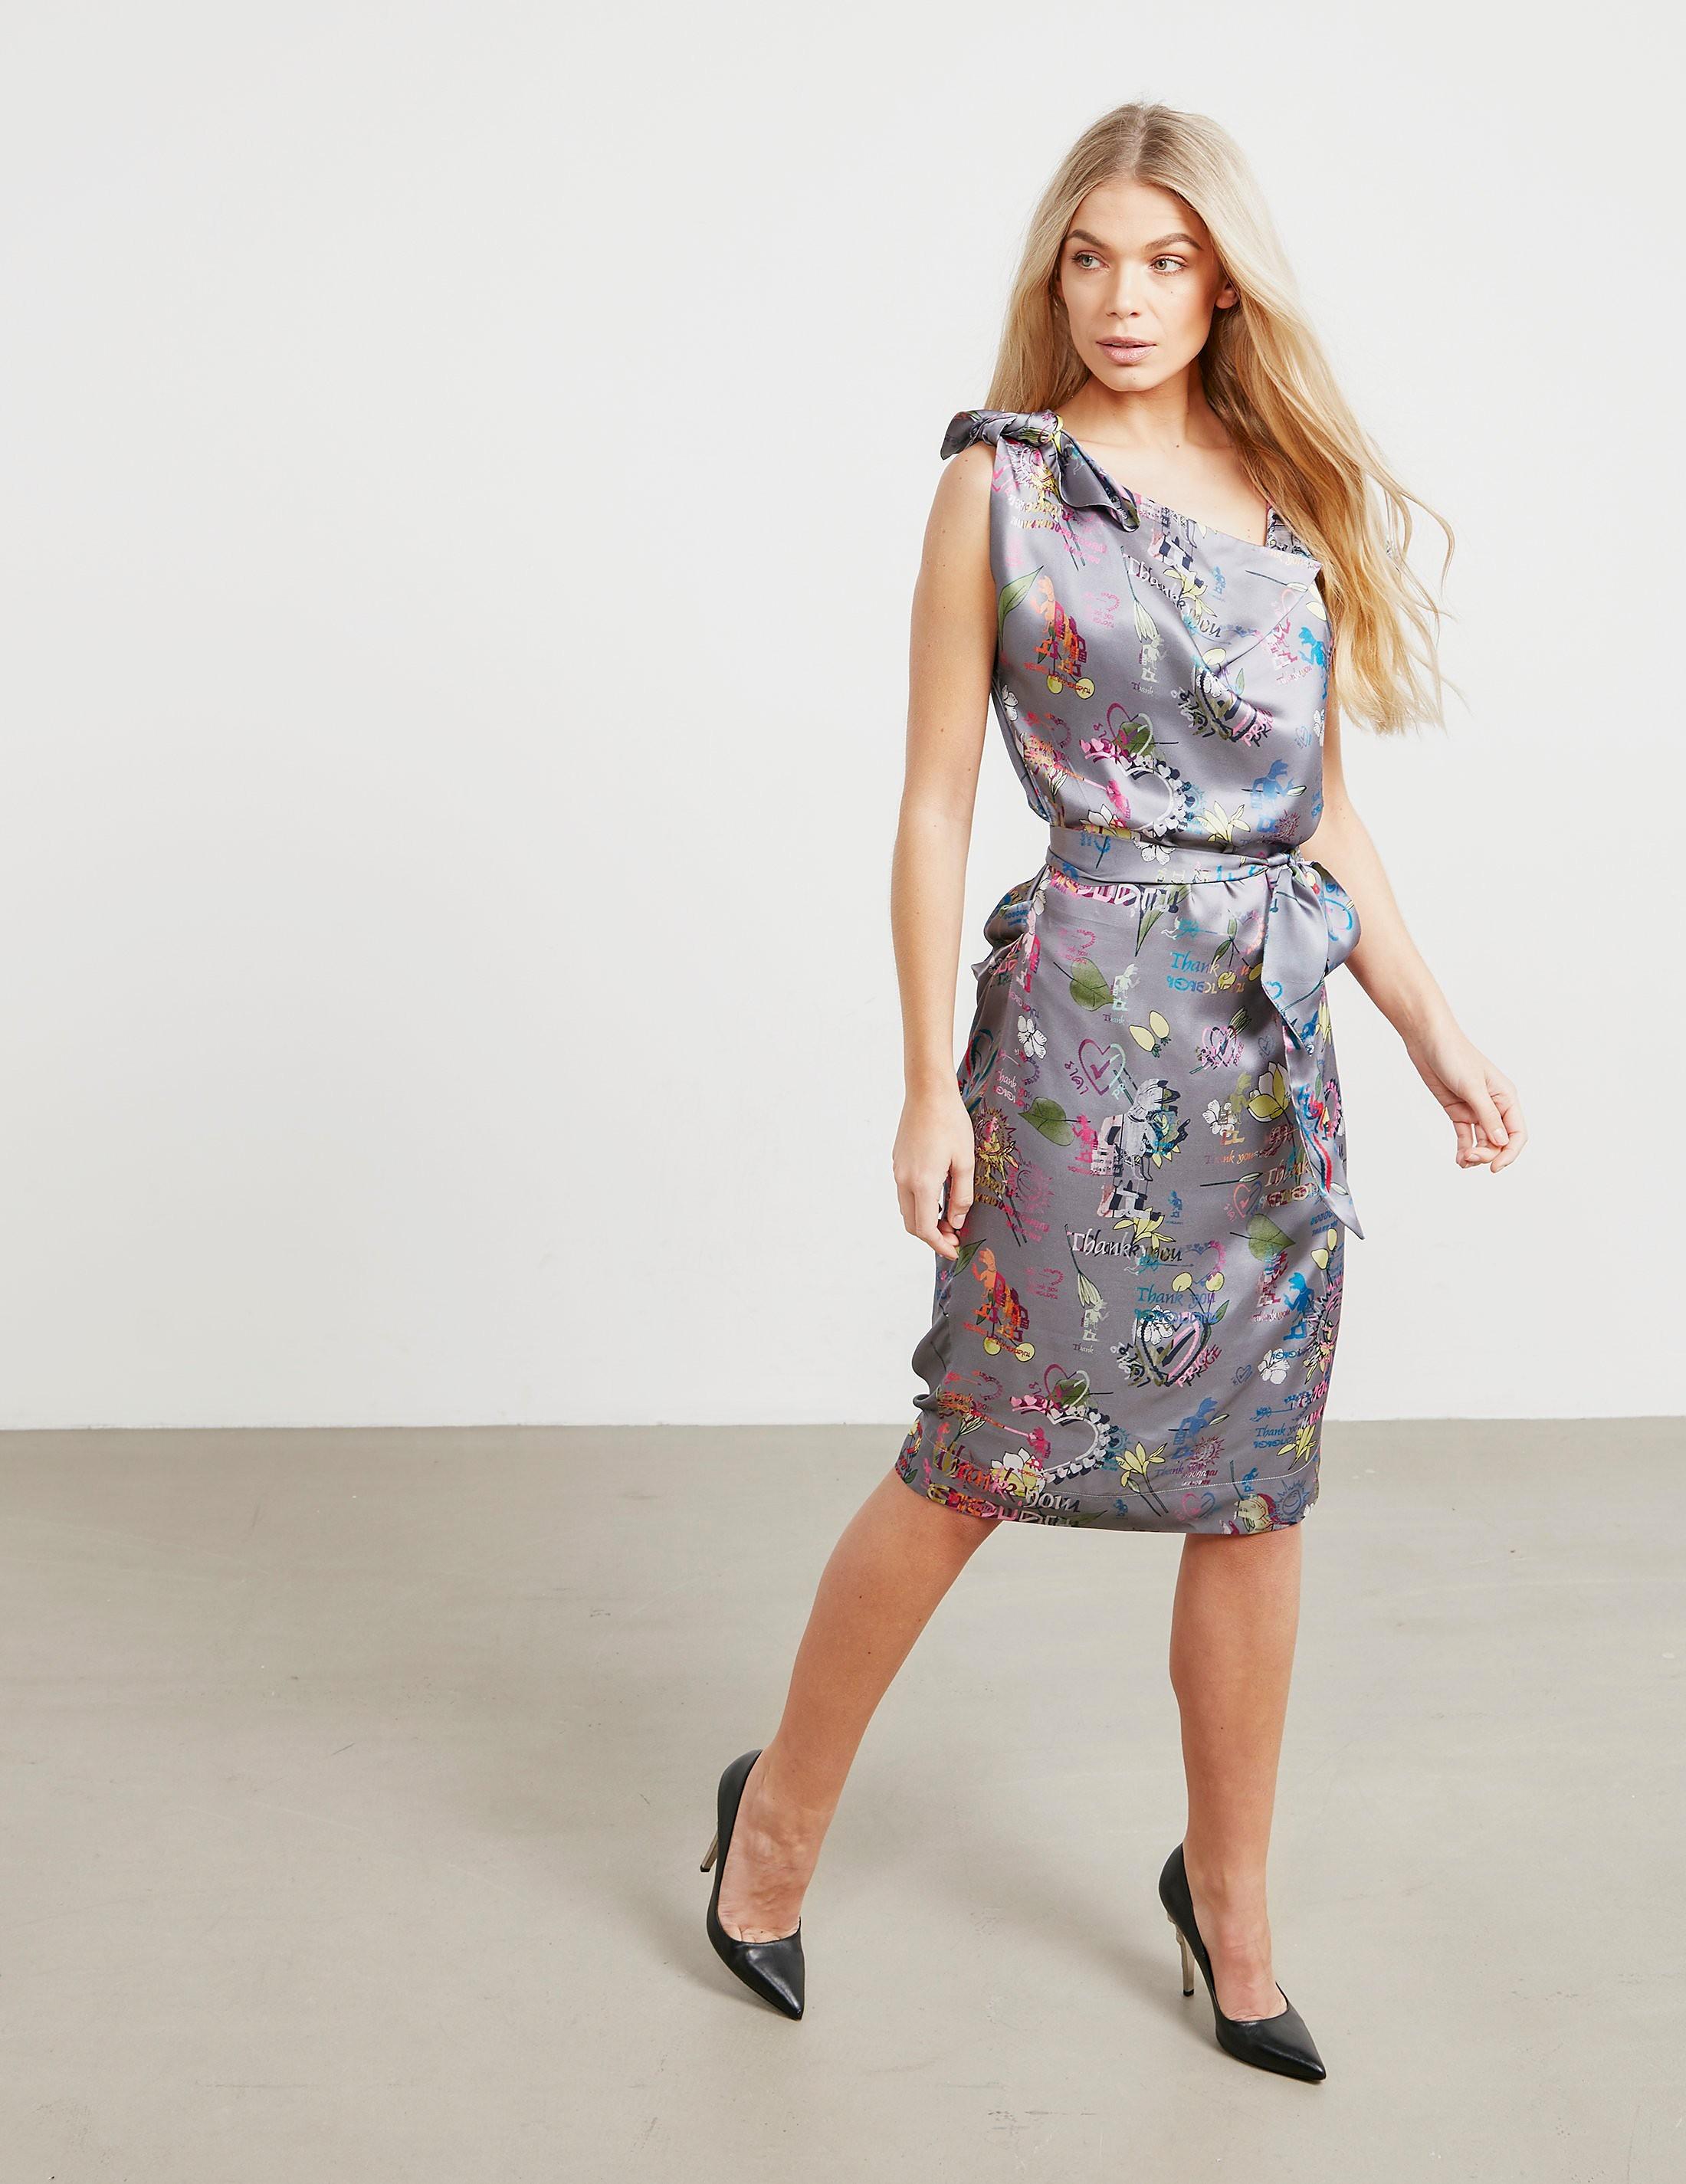 Vivienne Westwood Anglomania Shore Print Dress